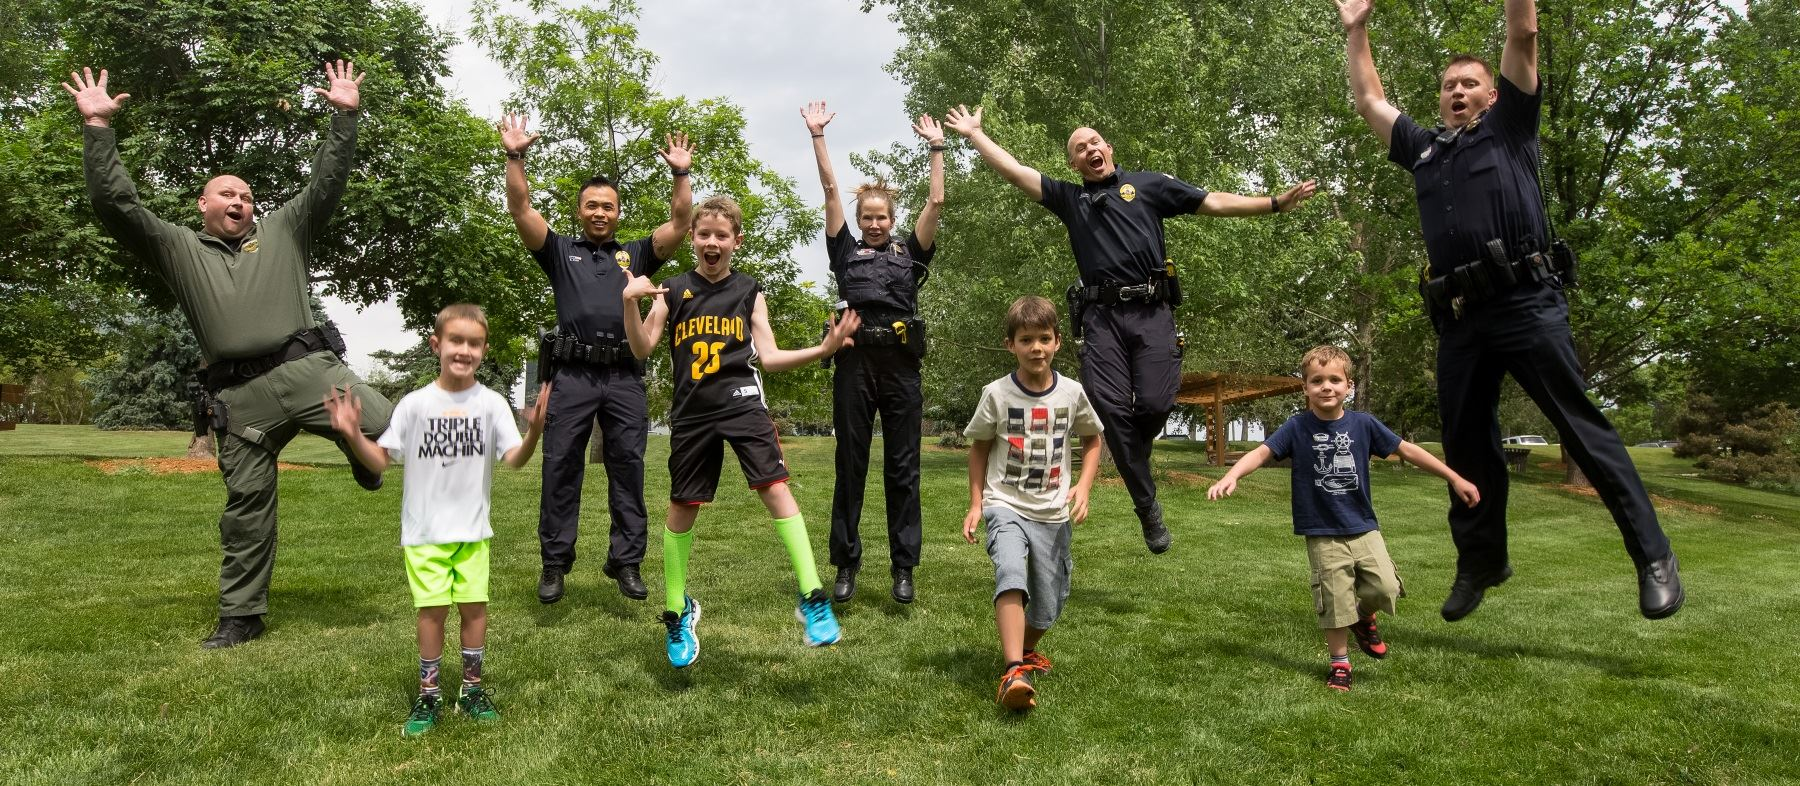 Police Department | Greenwood Village Official Website!